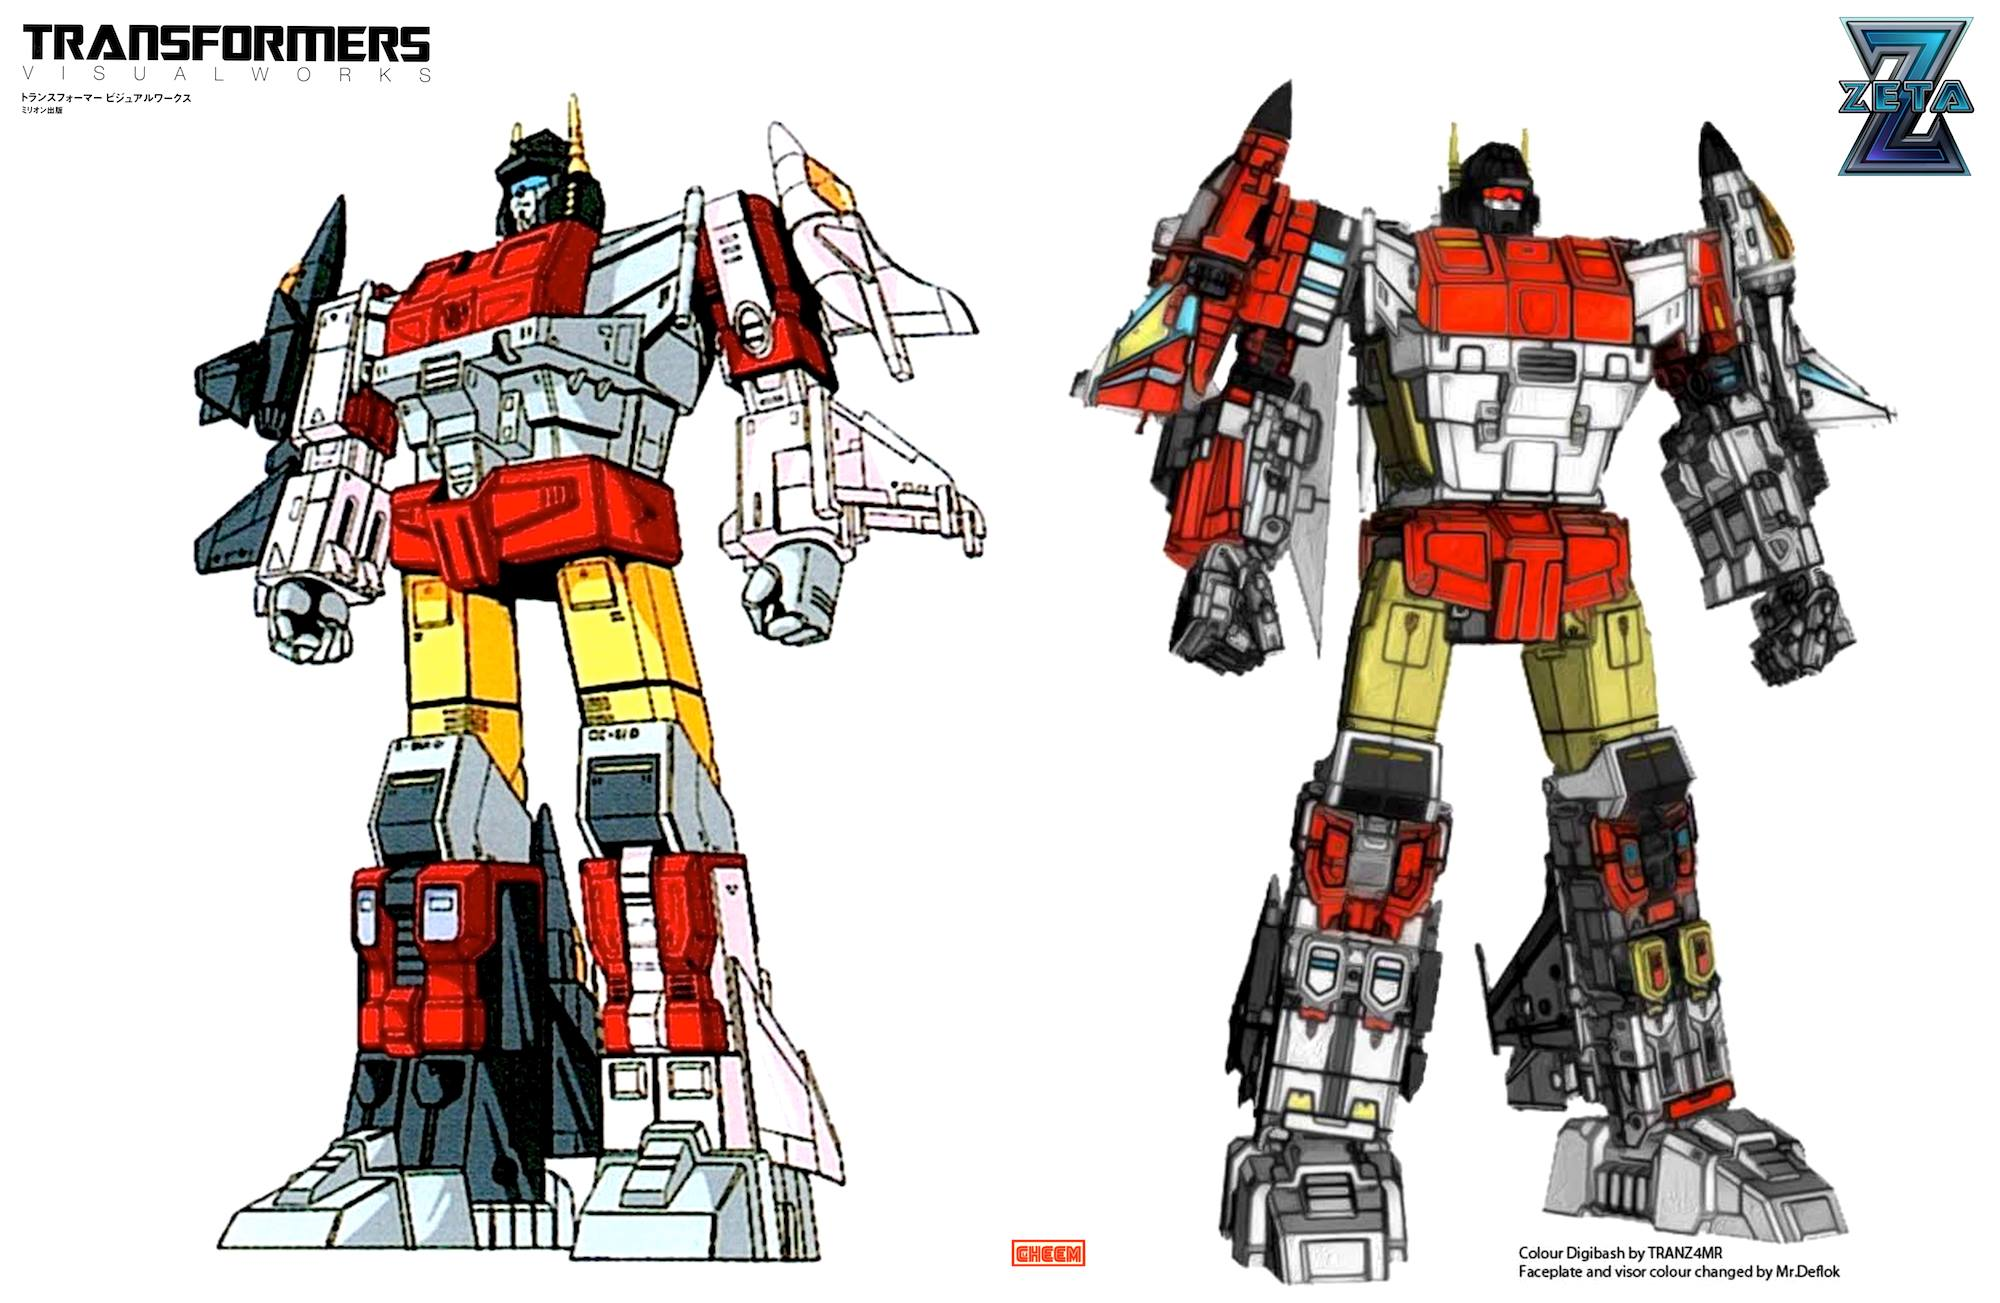 [Zeta Toys] Produit Tiers ― Kronos (ZB-01 à ZB-05) ― ZB-06|ZB-07 Superitron ― aka Superion - Page 2 U96cuakg_o